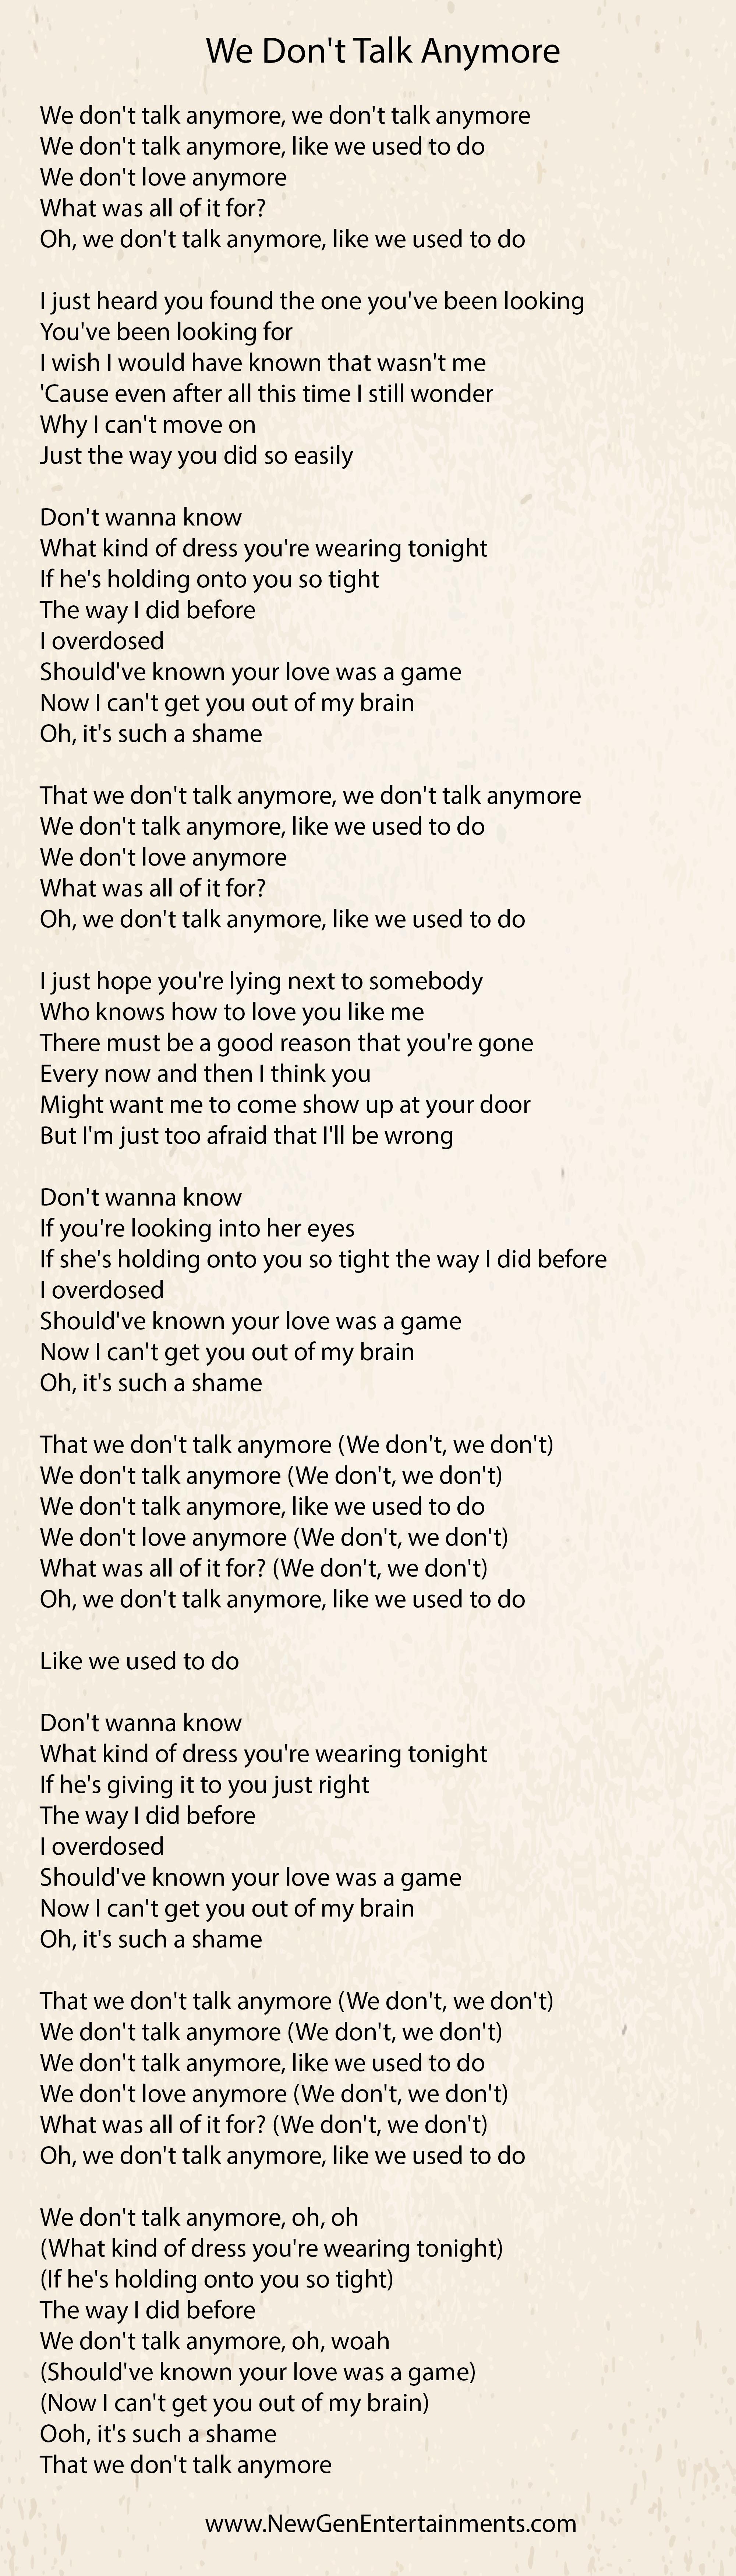 We Dont Talk Anymore | Lyrics | Charlie Puth - New Gen